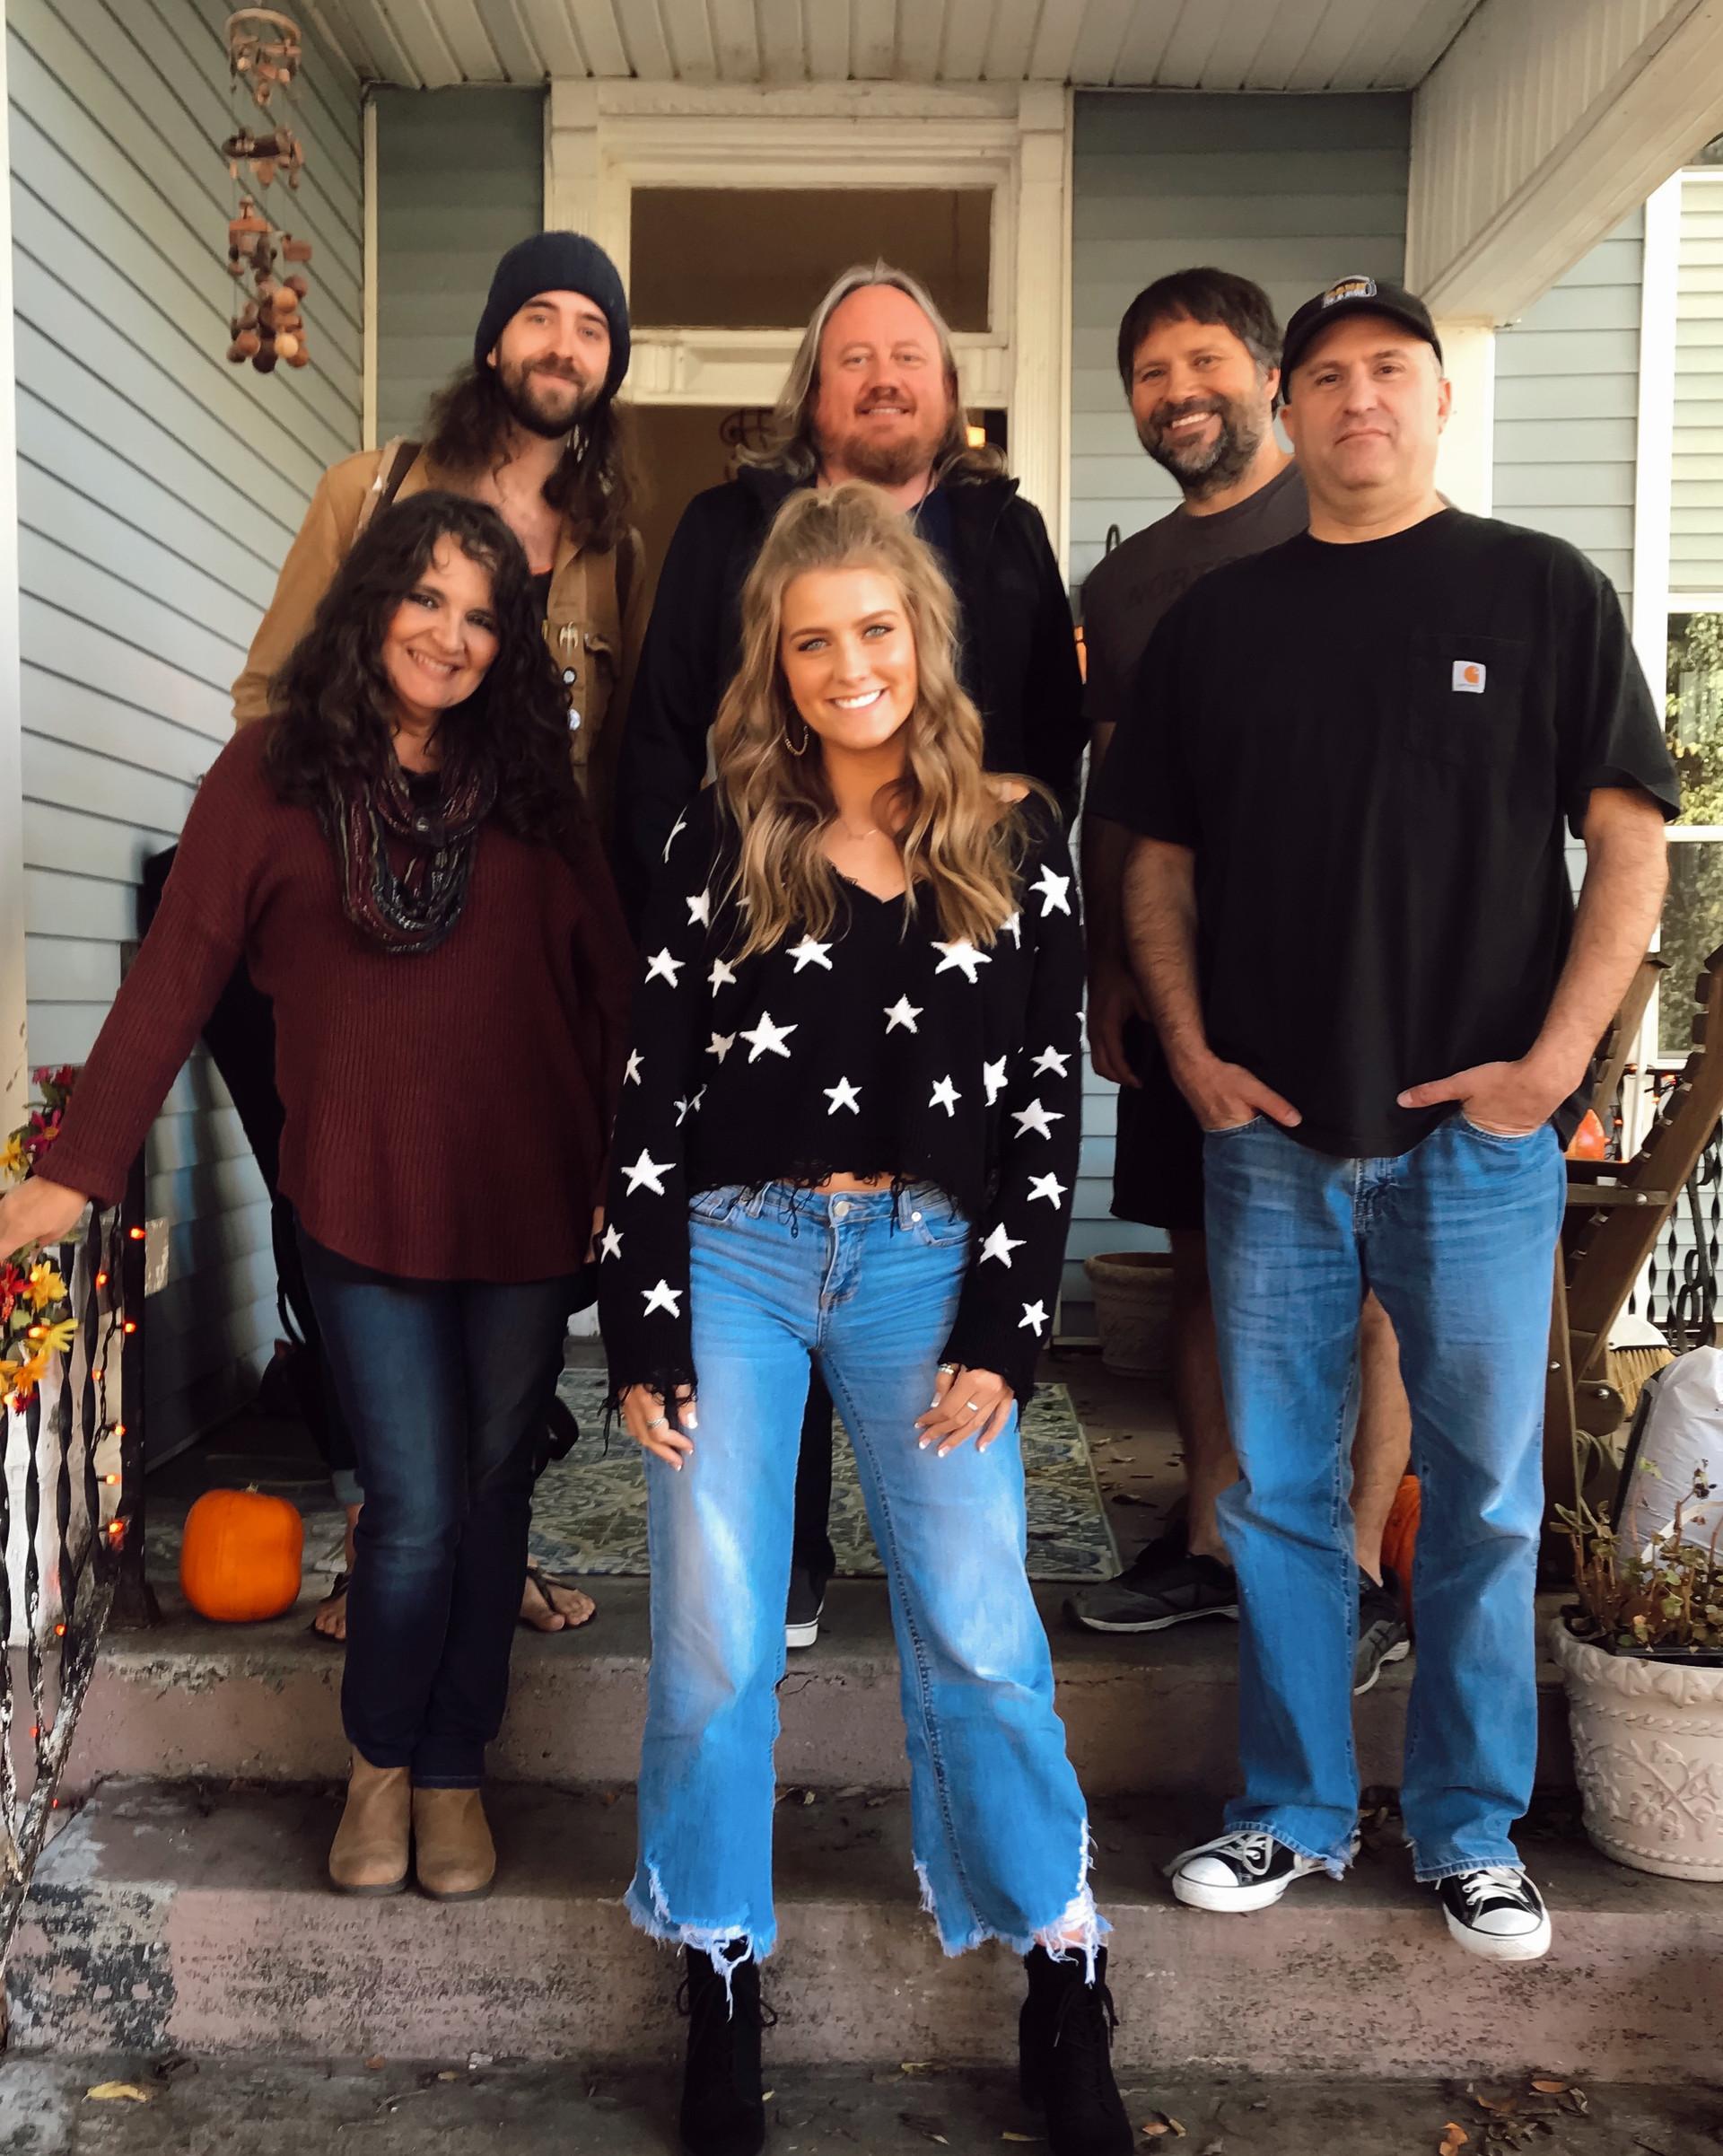 Faith, Wanda Vick, Jake Finch, Brian Allen, Mike Durham, and Greg Bieck